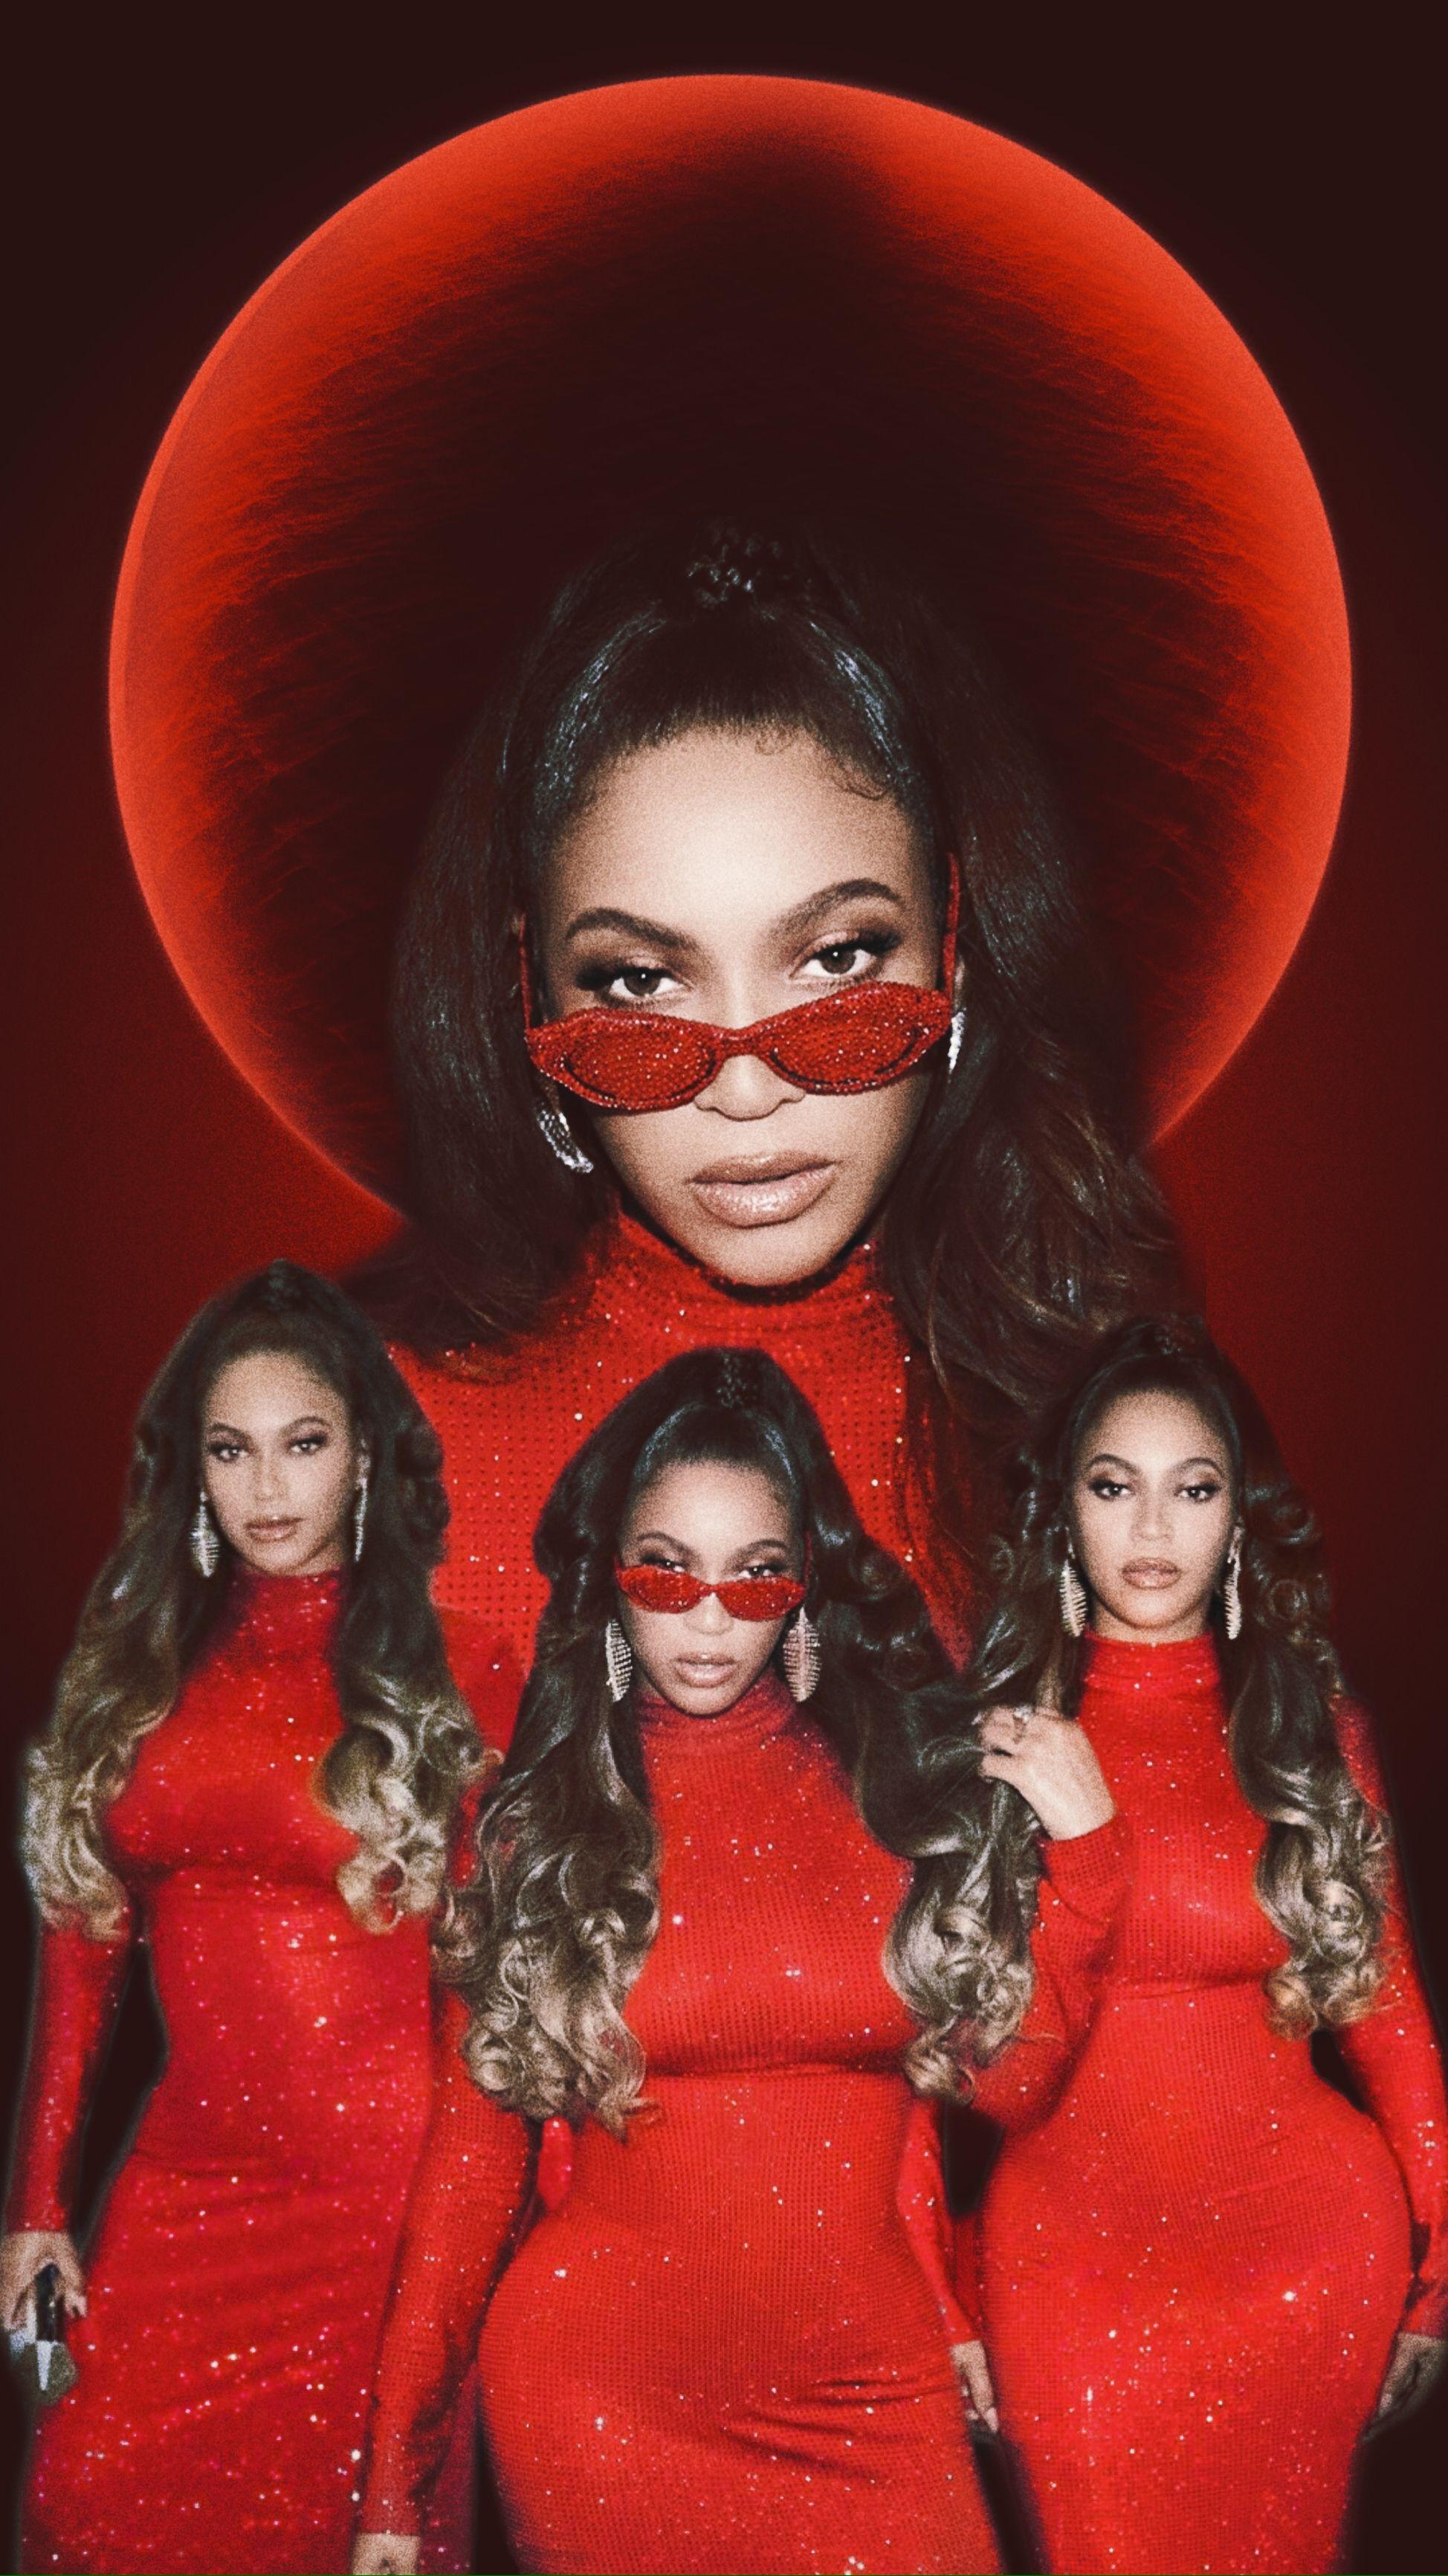 Beyonce Red Moon Wallpaper Beyonce Wallpaper The Best Films Beyonce Beyonce Flawless